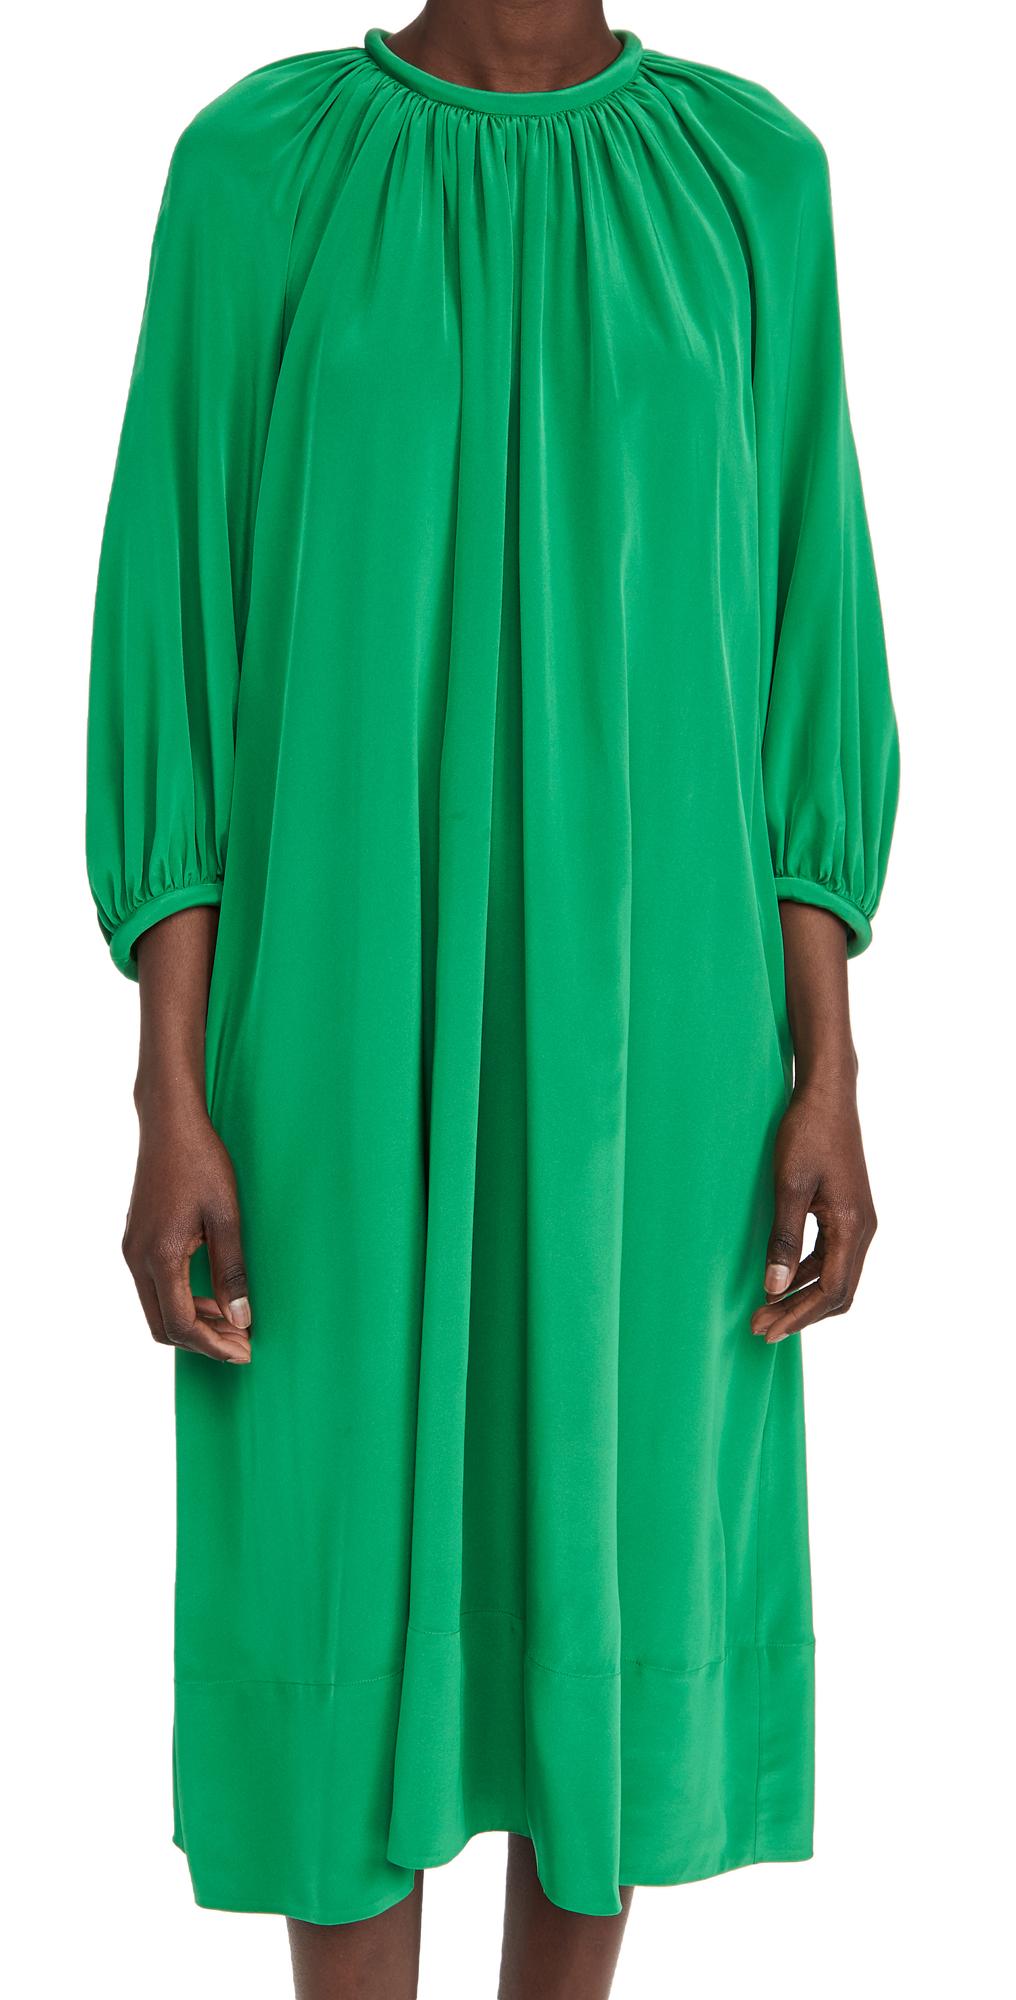 Tibi ECO SILK SHIRRED NECK PITCHED DRESS